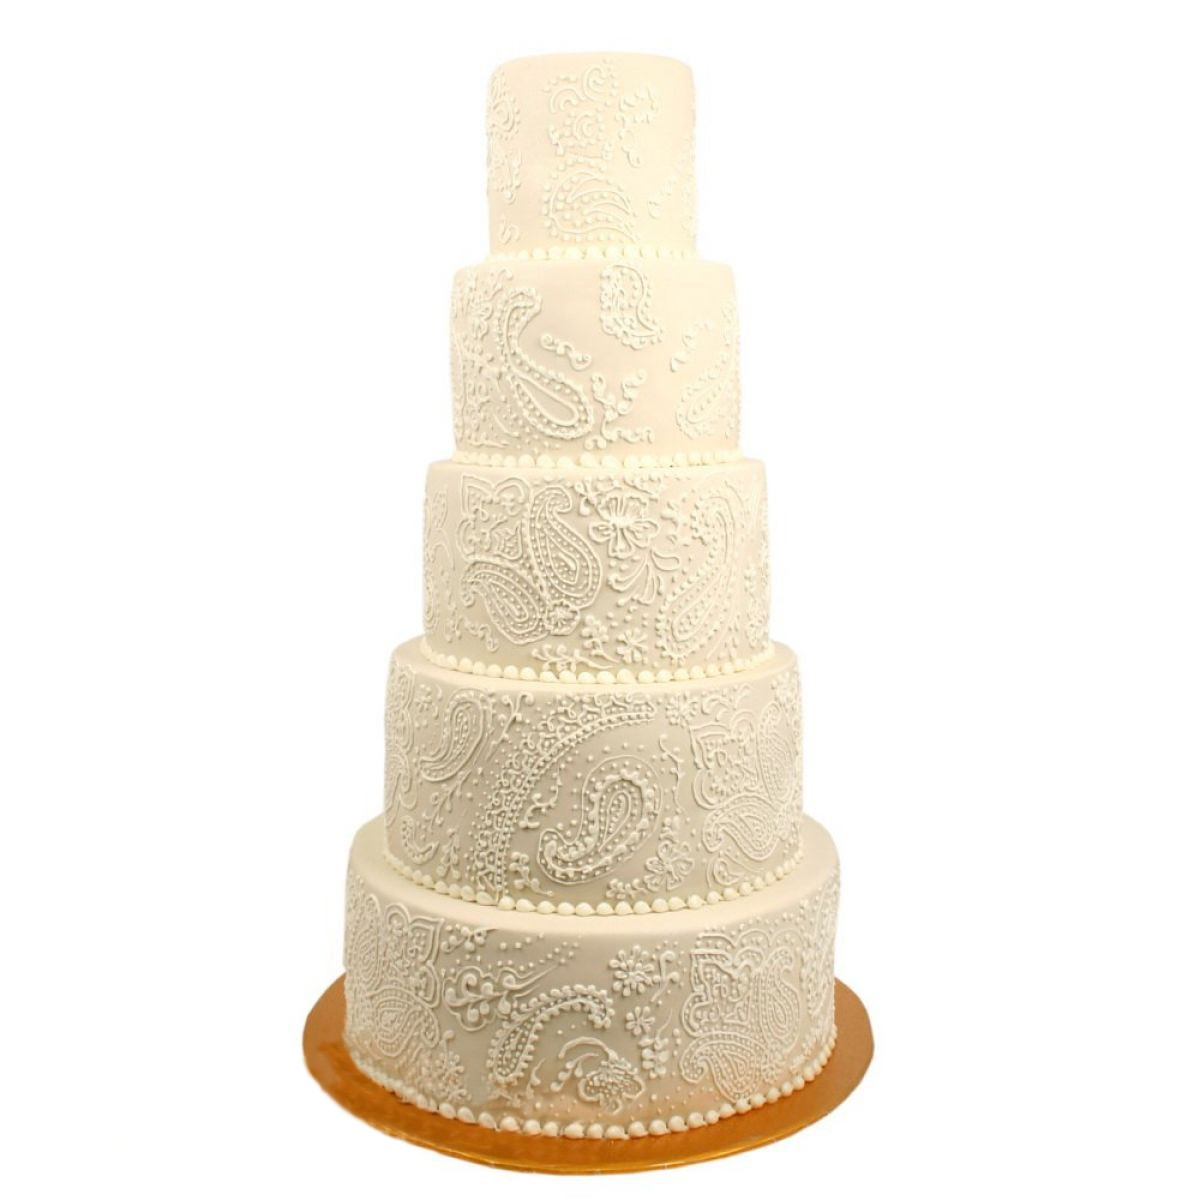 №1153 Торт ажурный